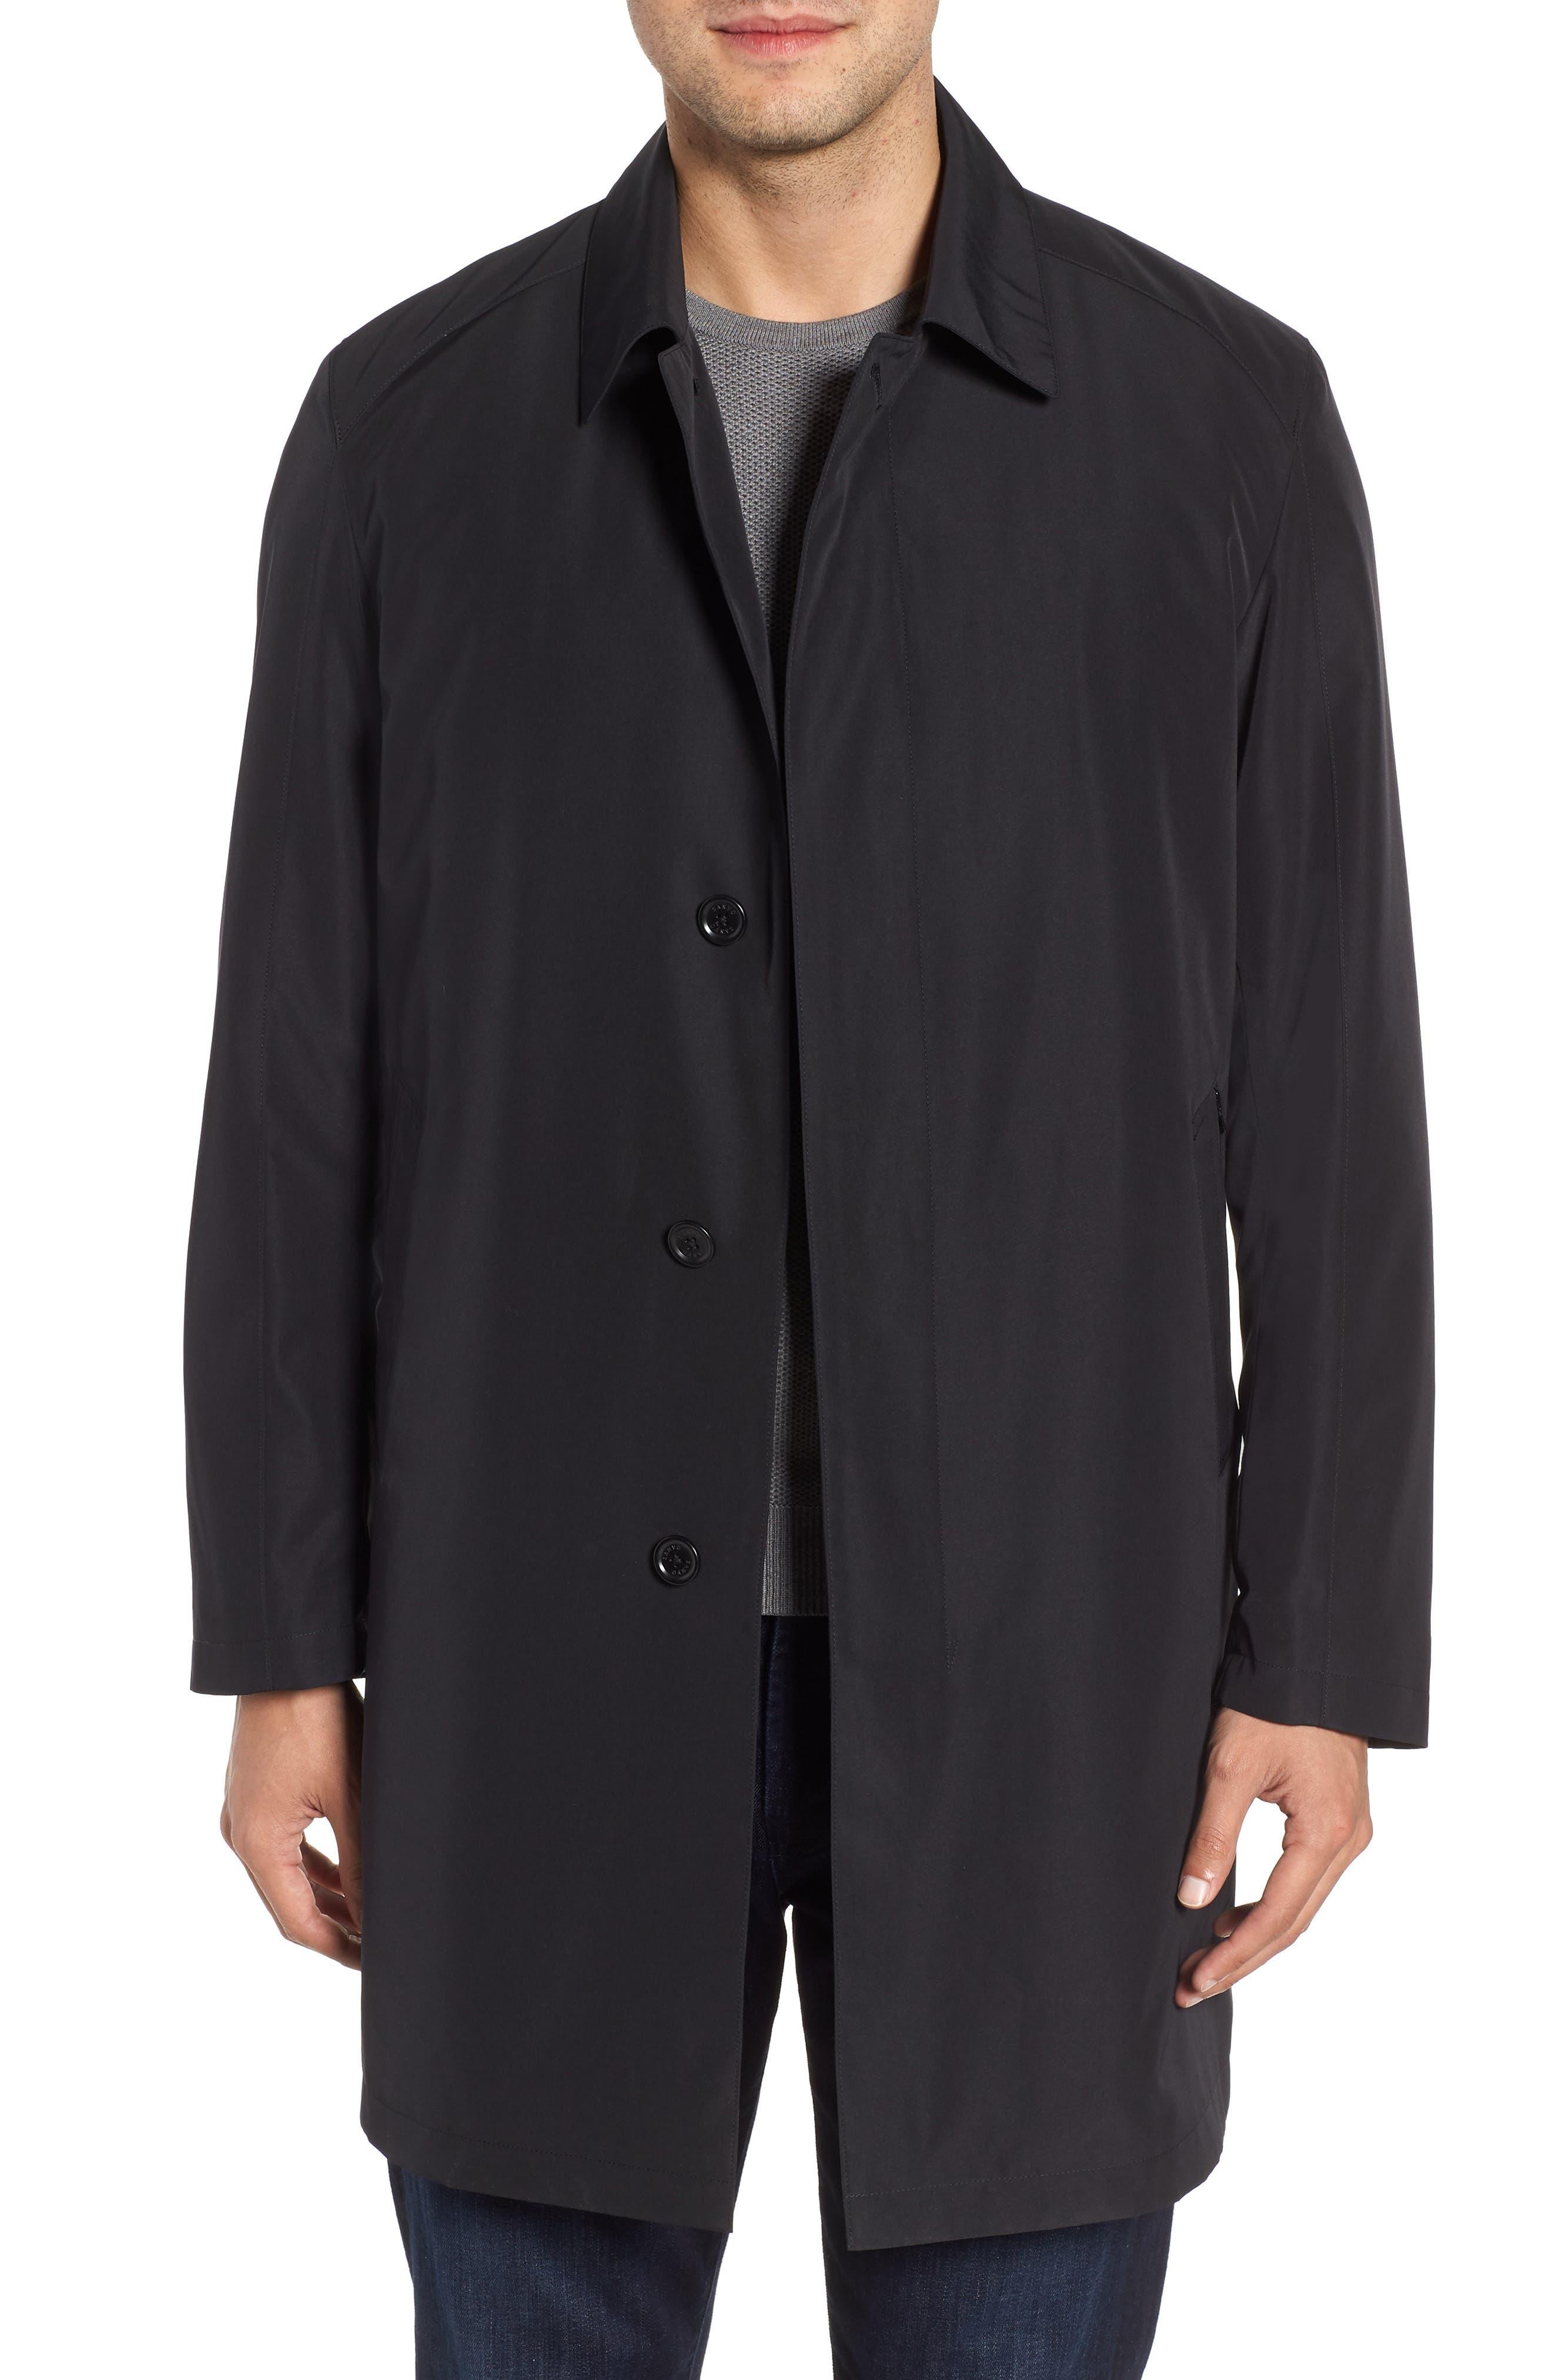 Ducasse Raincoat,                             Main thumbnail 1, color,                             BLACK